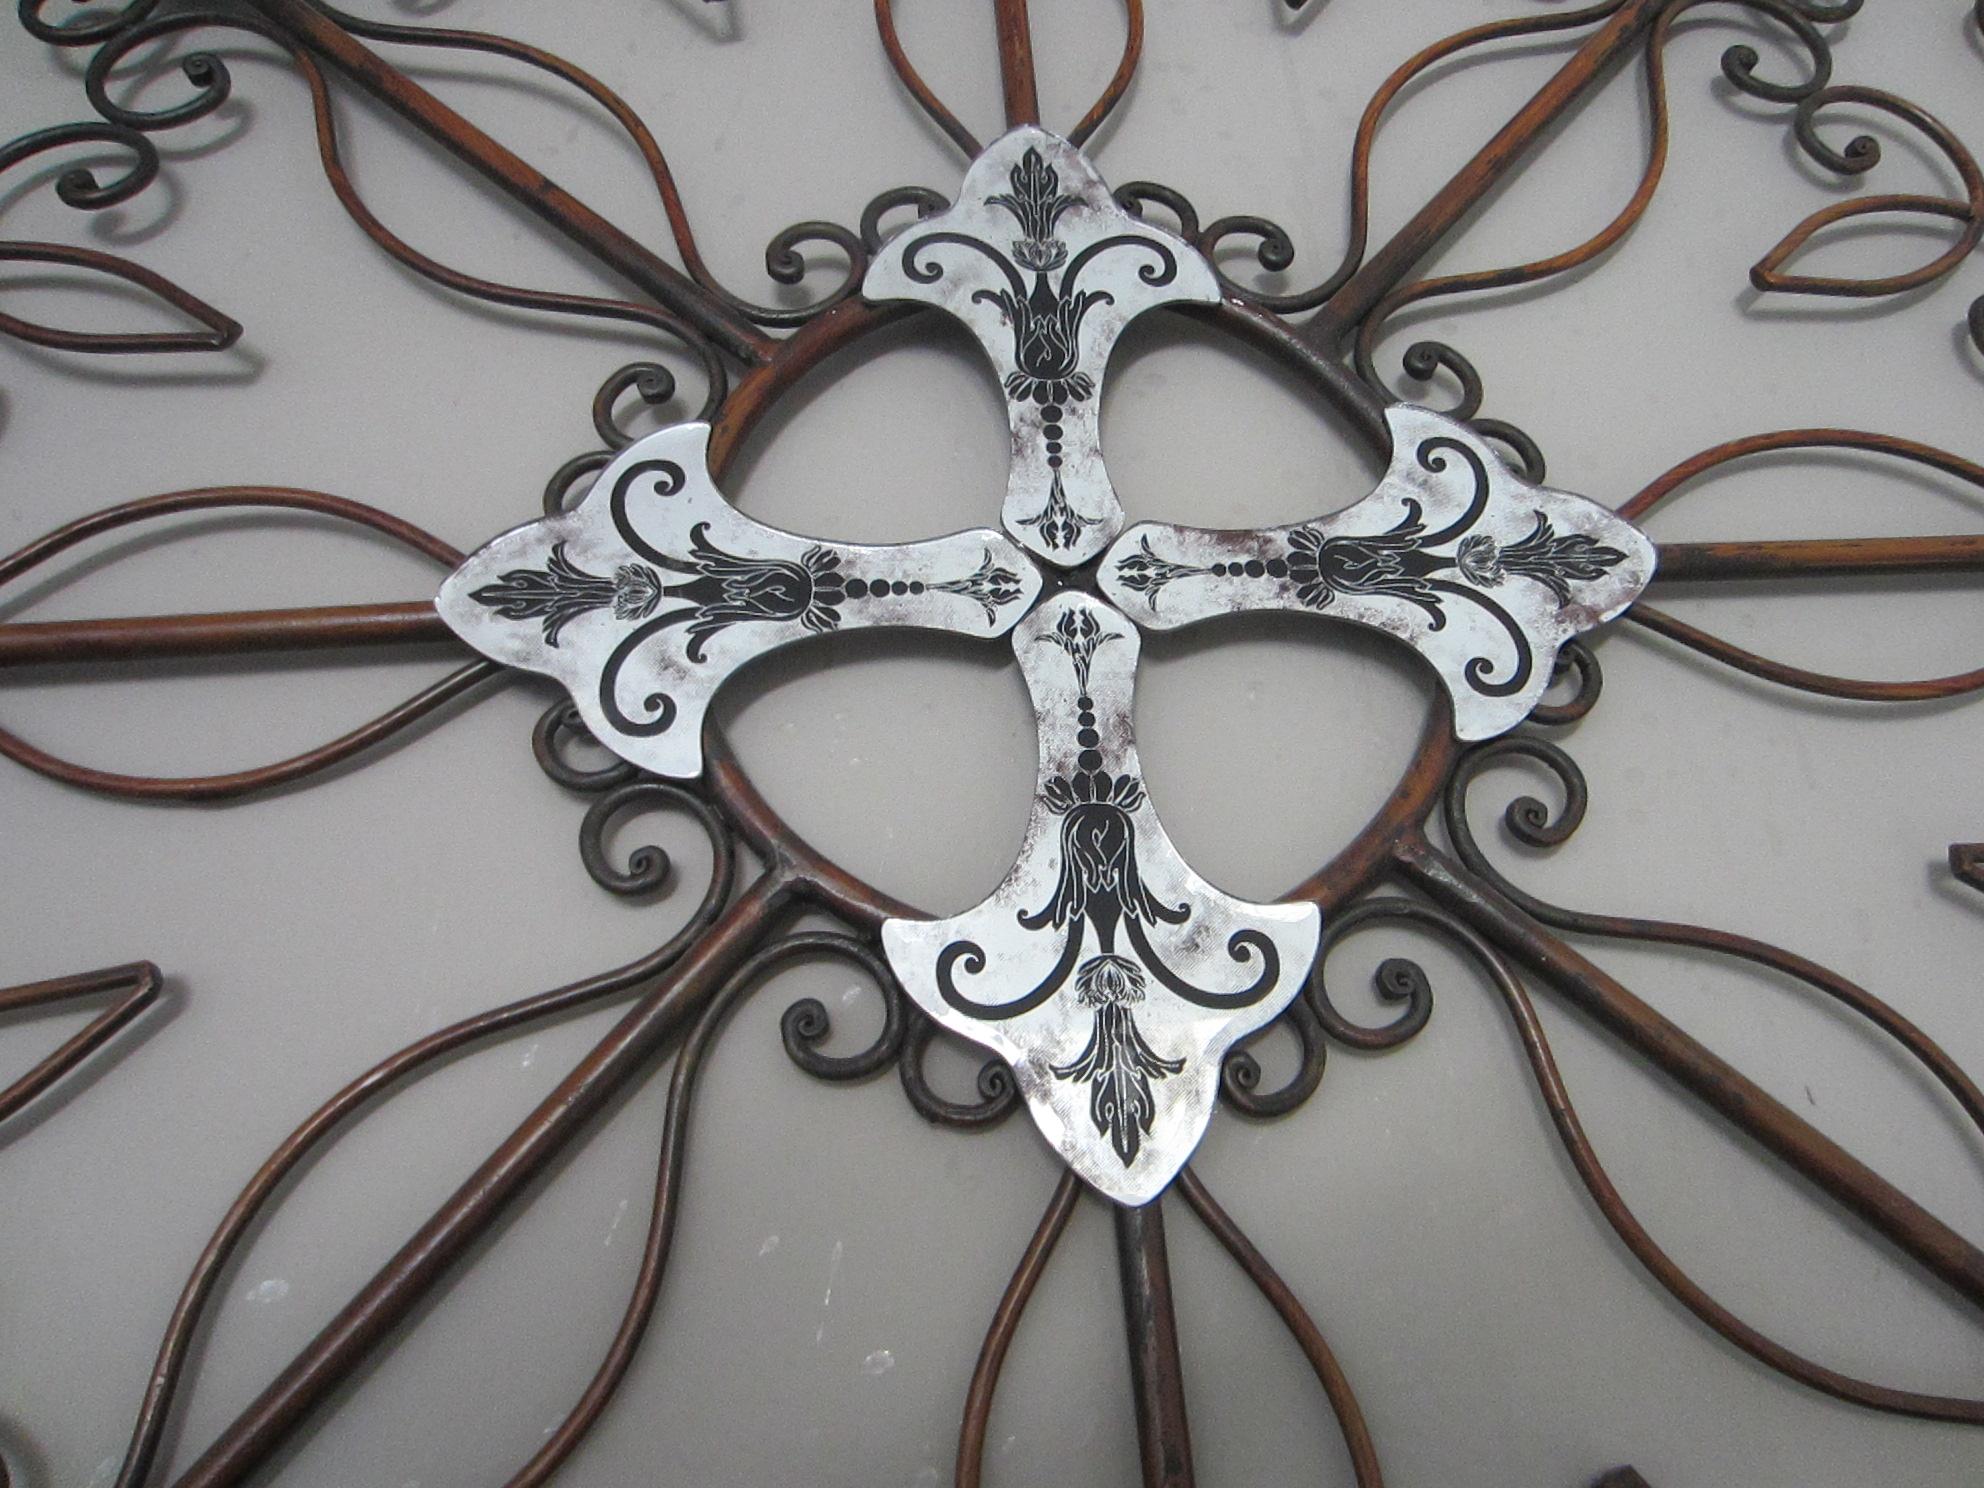 Round Wire Wall Decor : Modernist mirrored round metal wall decor decorative black